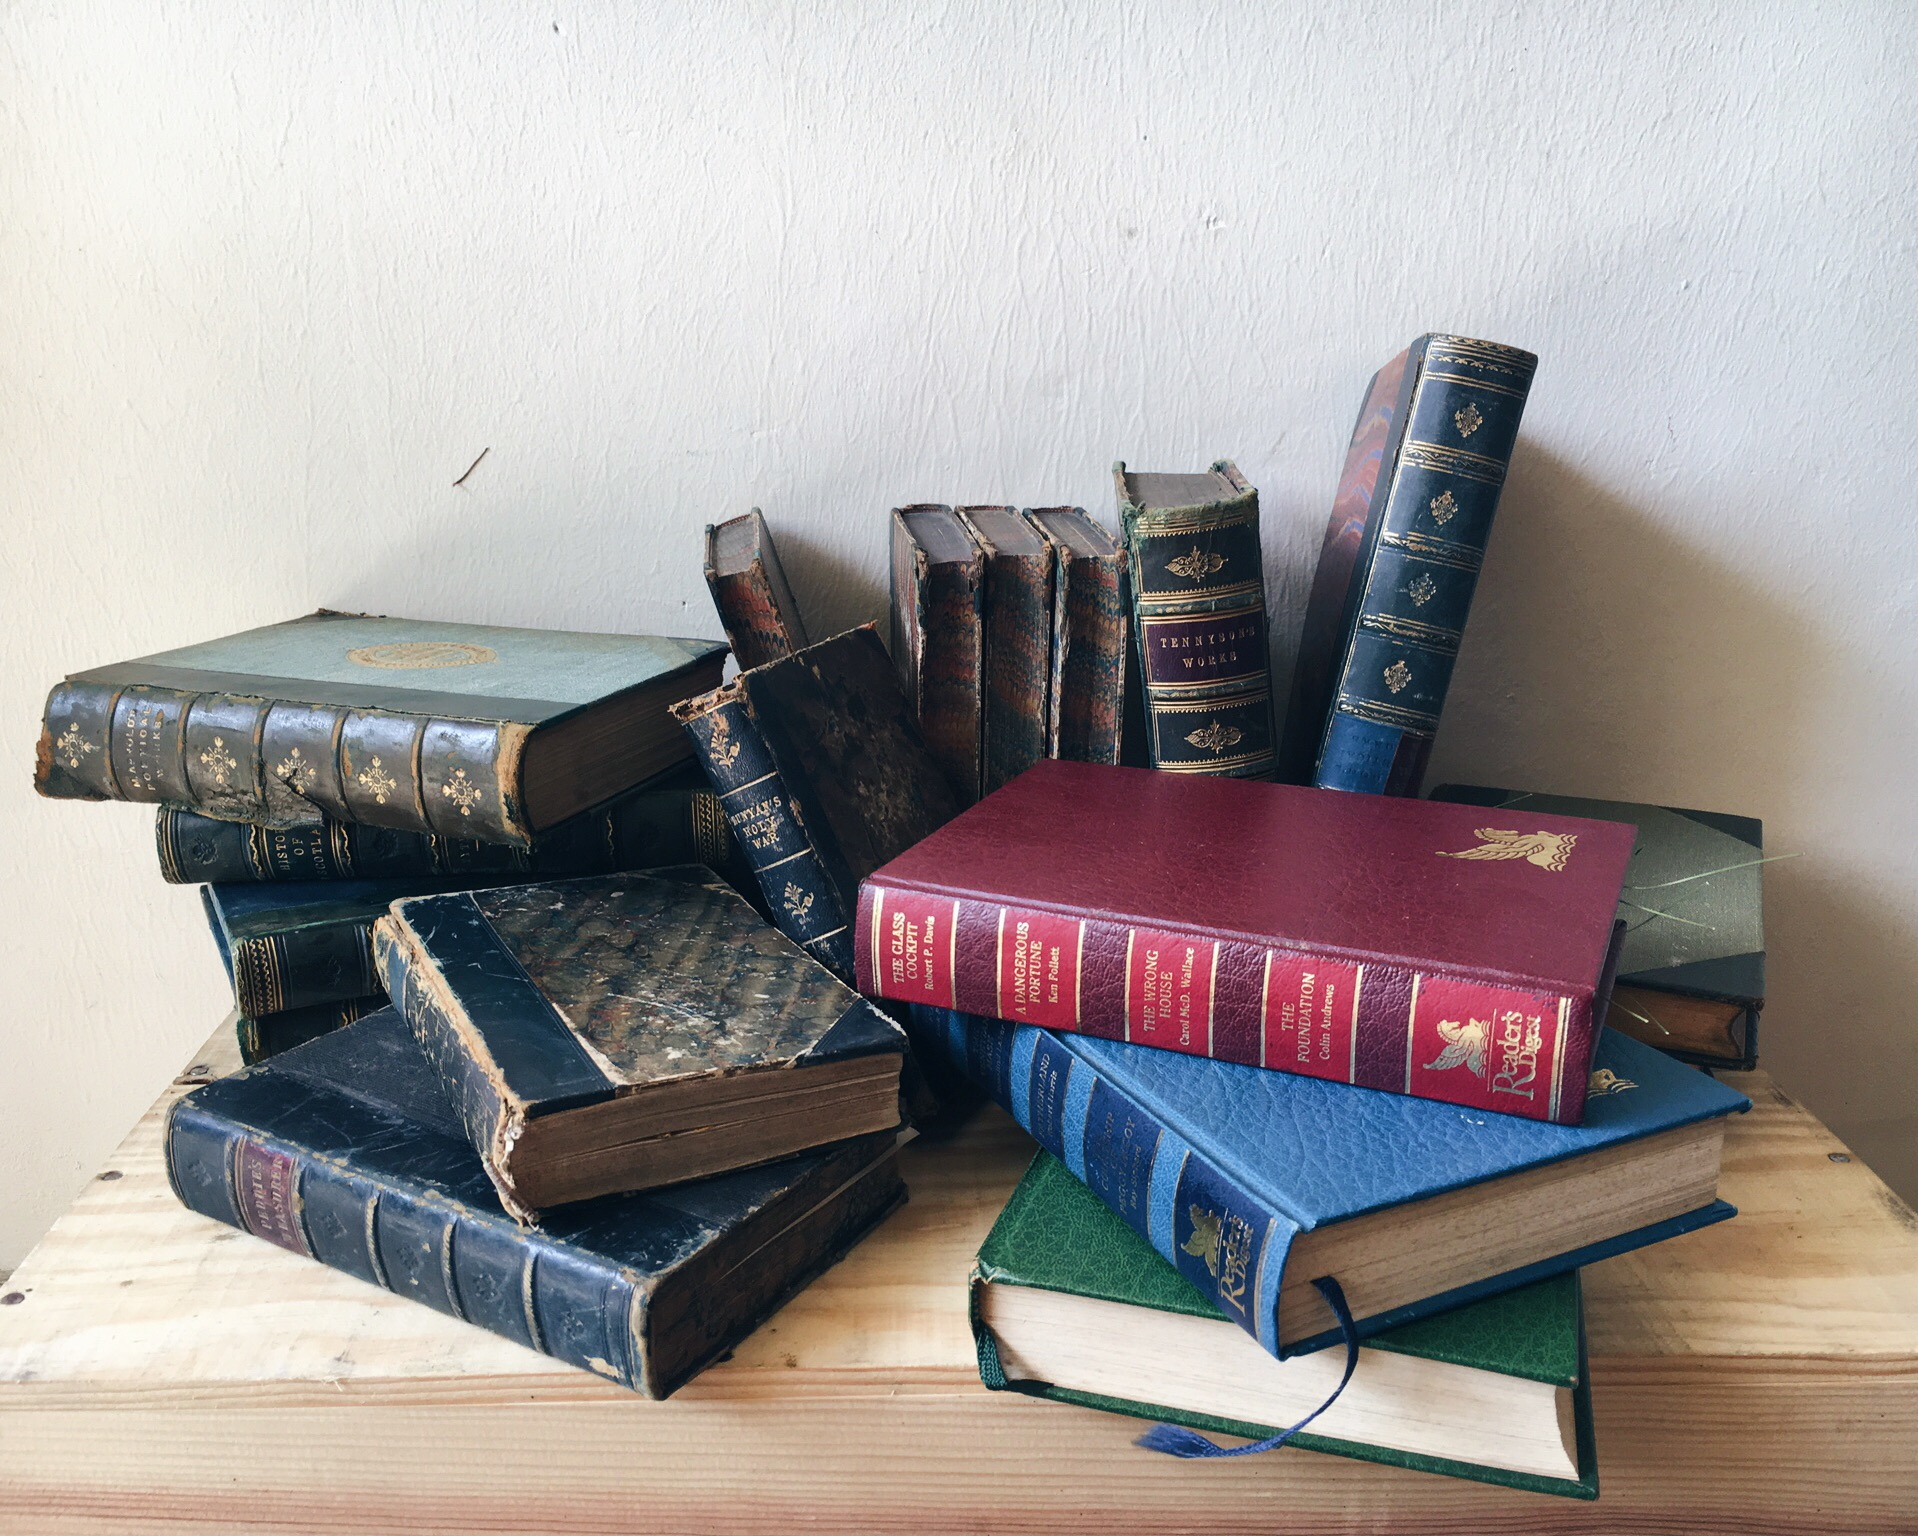 display books 2.JPG